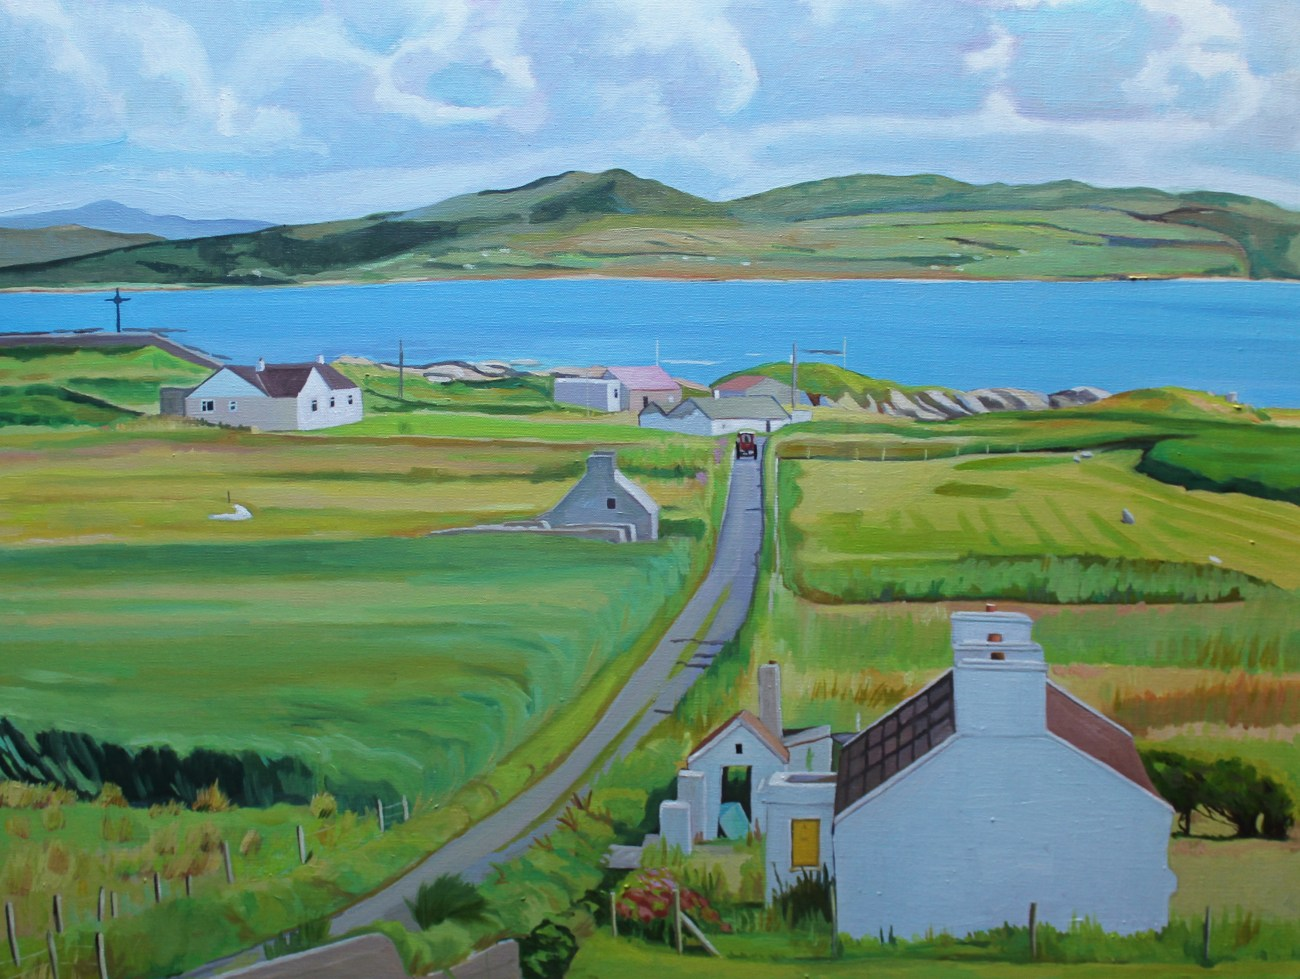 landscape painting of Arranmore Island, Ireland